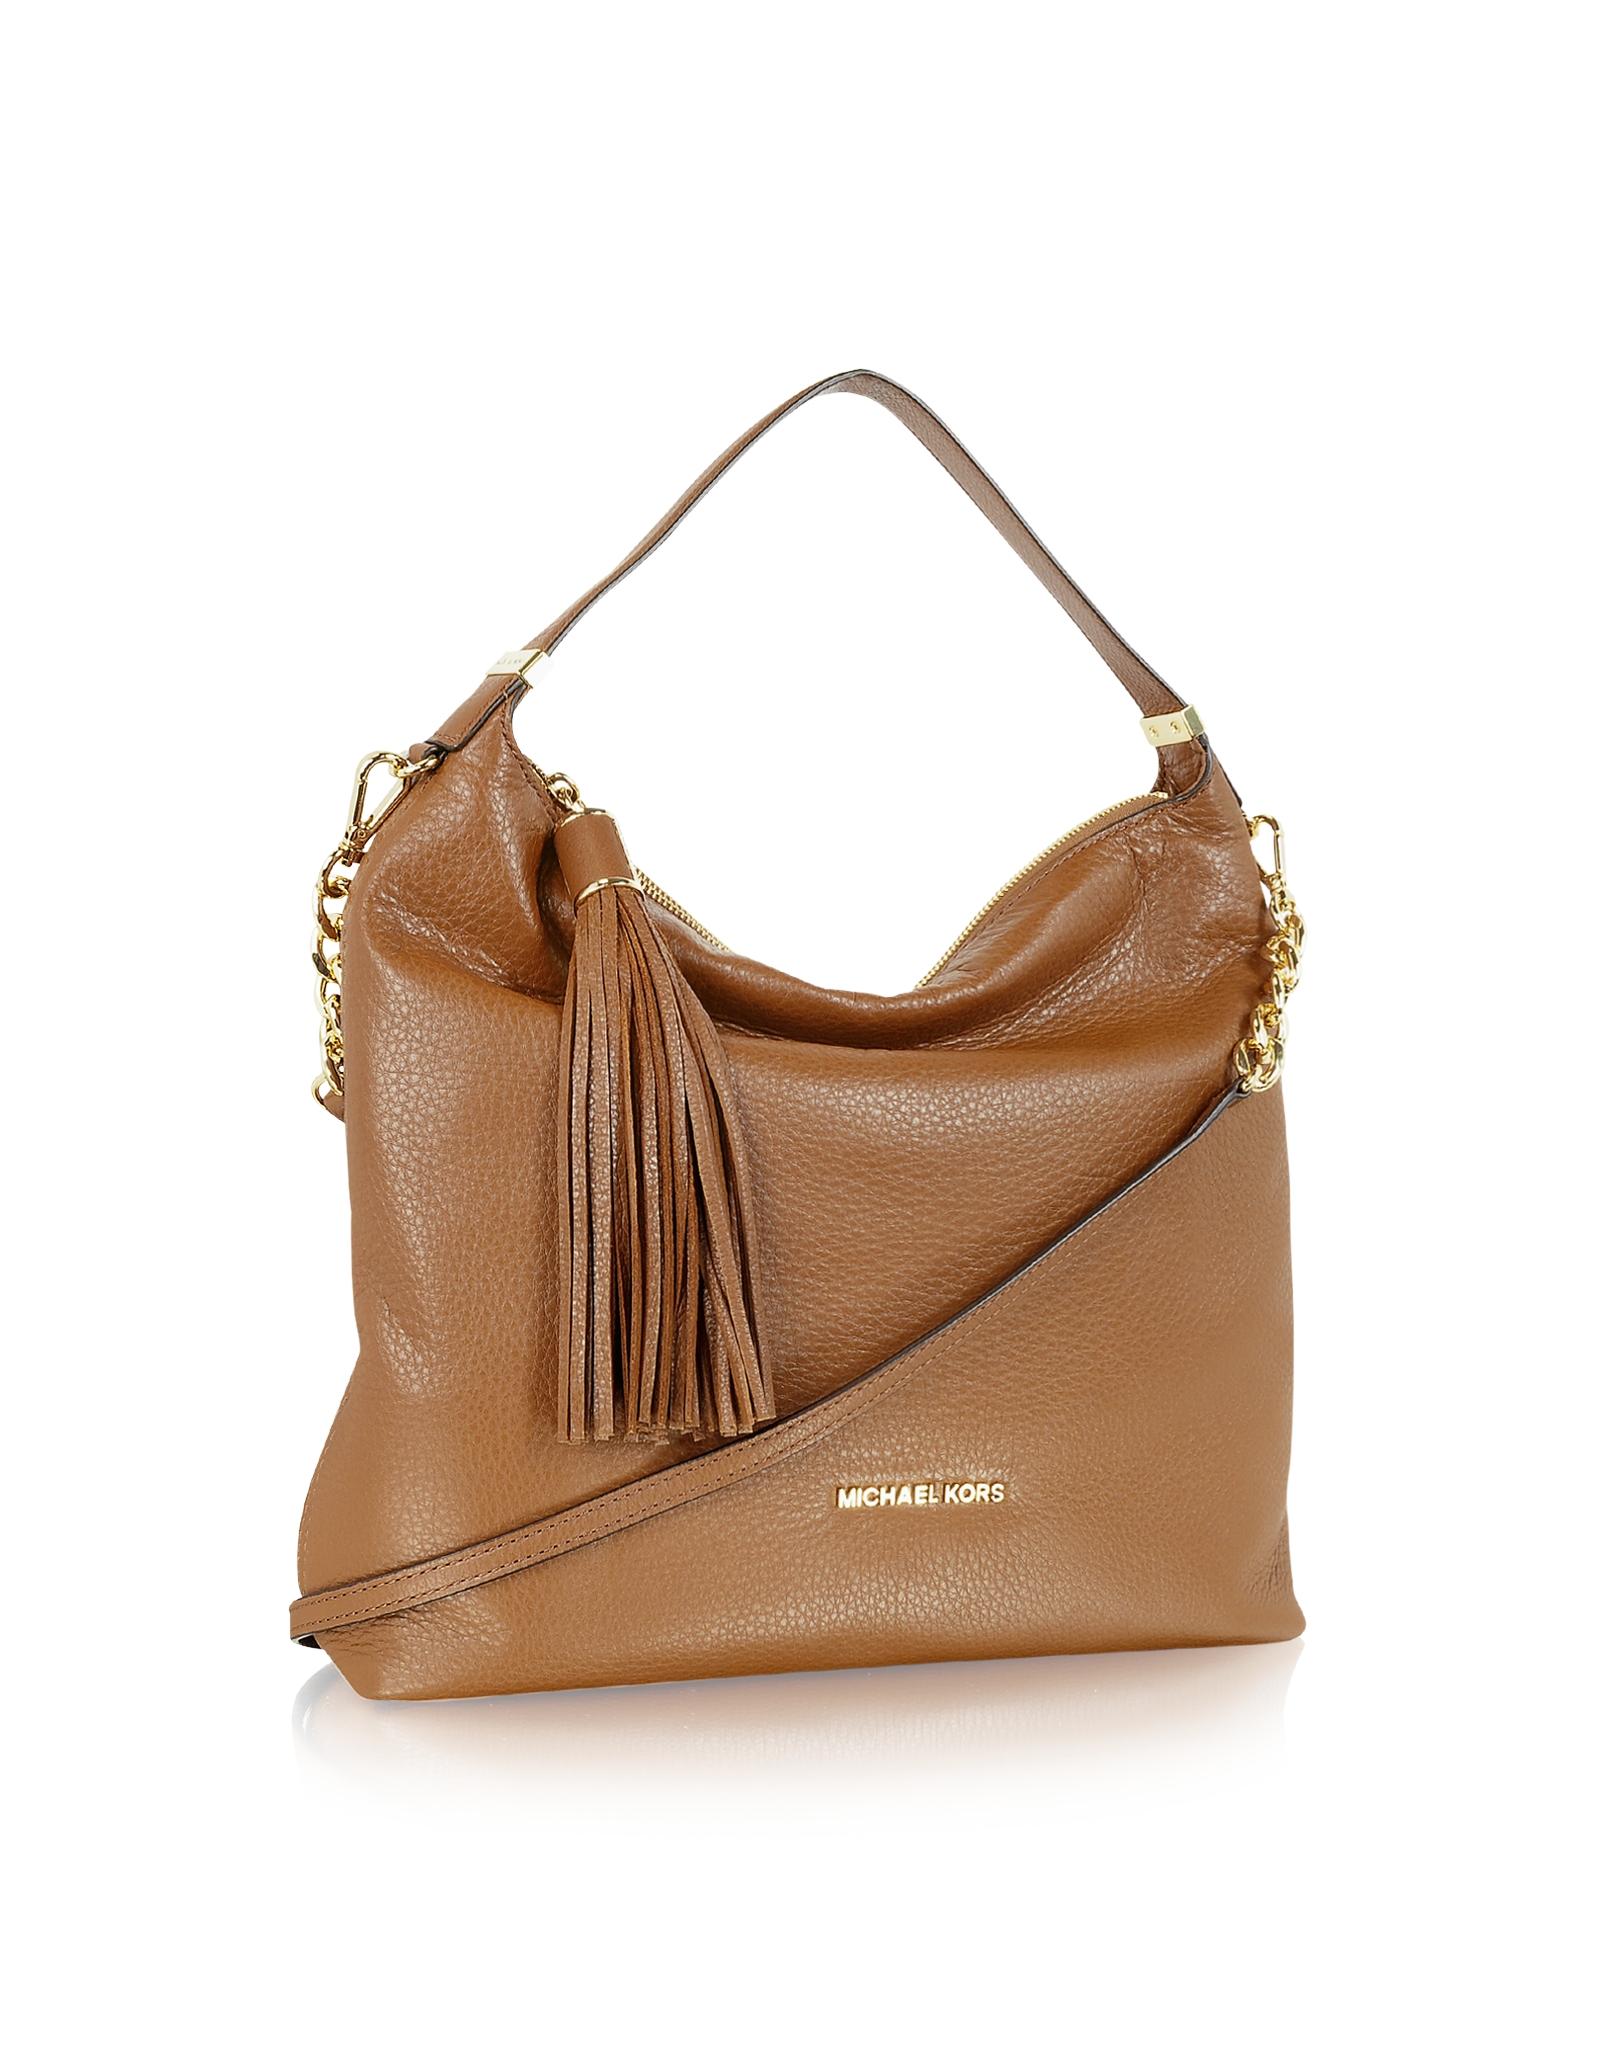 b2329e719304 Lyst - Michael Kors Large Weston Pebbled Shoulder Bag in Brown